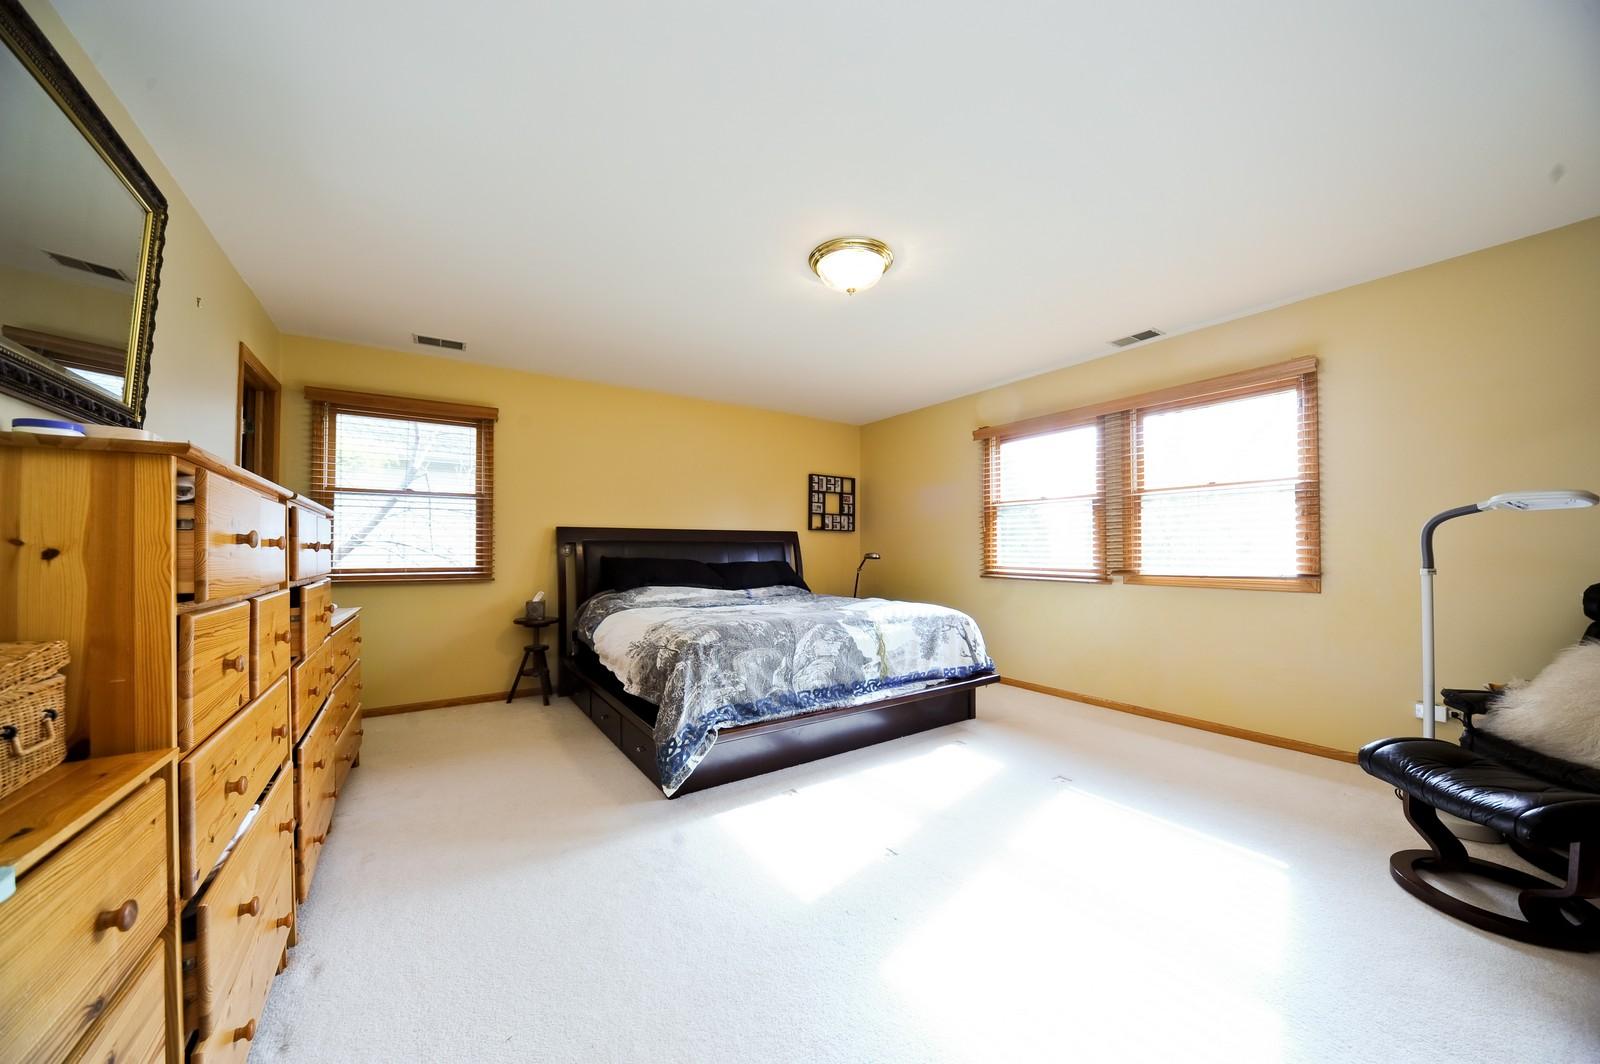 Real Estate Photography - 394 Jefferson, Glencoe, IL, 60022 - Master Bedroom